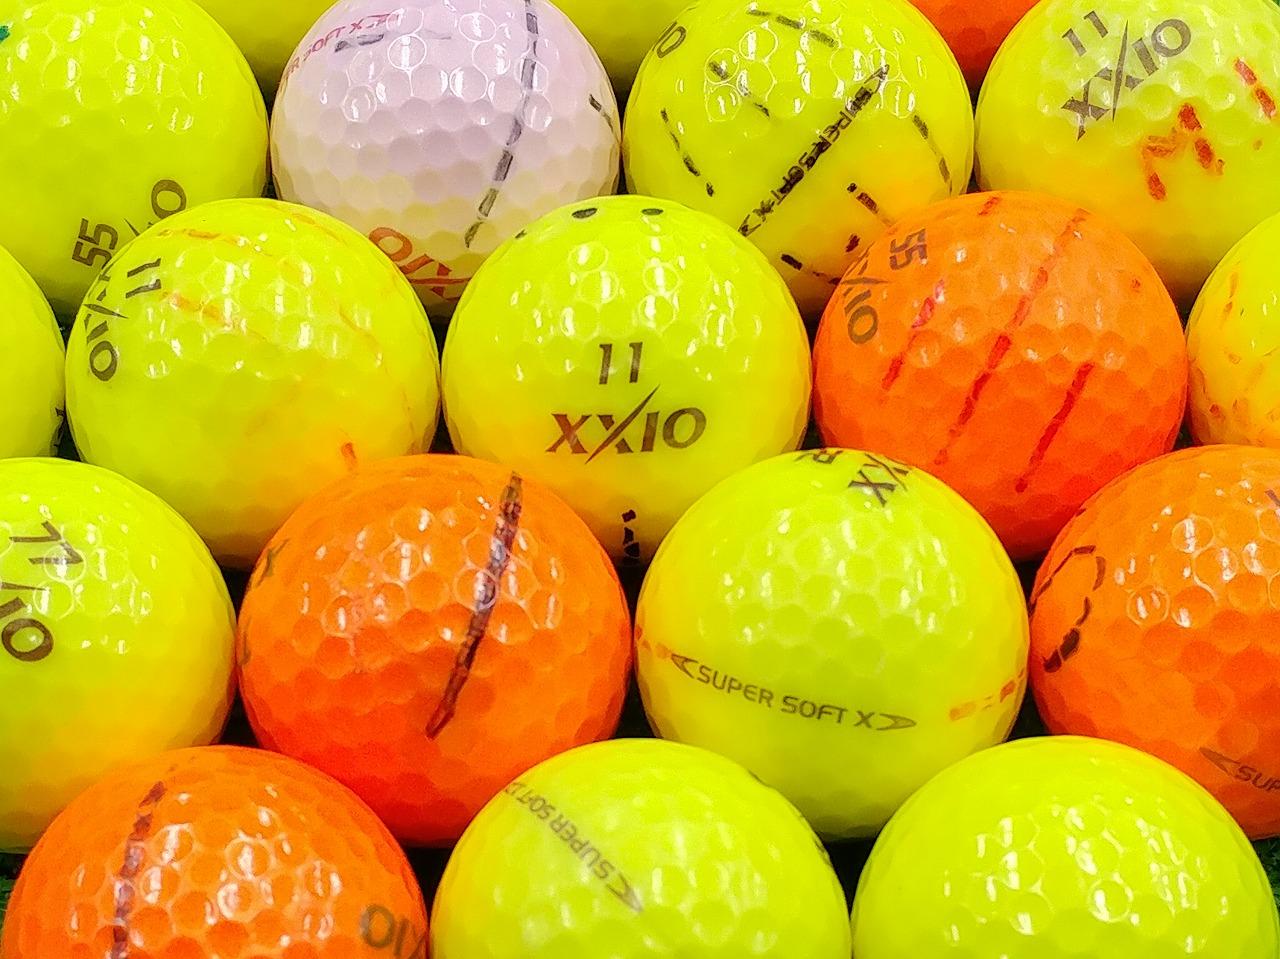 【ABランク落書き】XXIO(ゼクシオ) SUPER SOFT X カラーボール混合 2017年モデル 1個